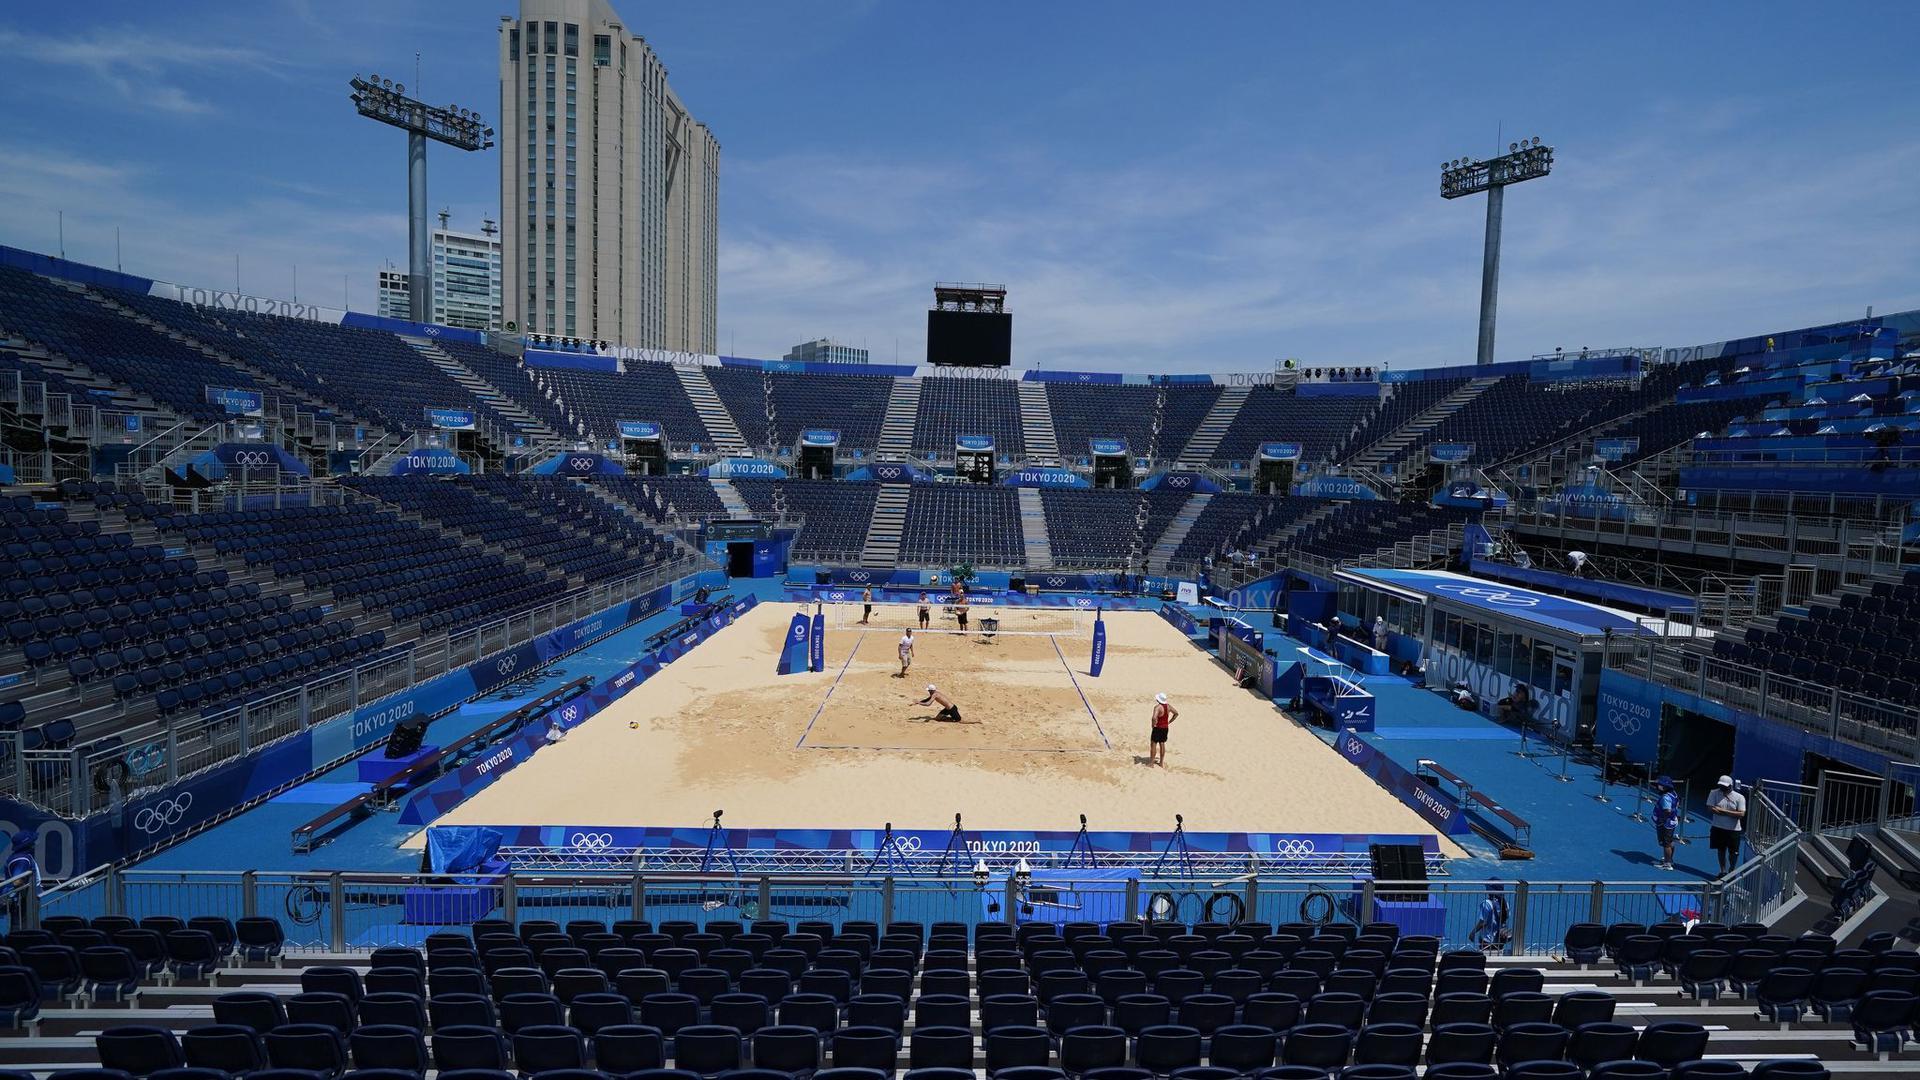 Das Beachvolleyball-Stadion in Tokio.